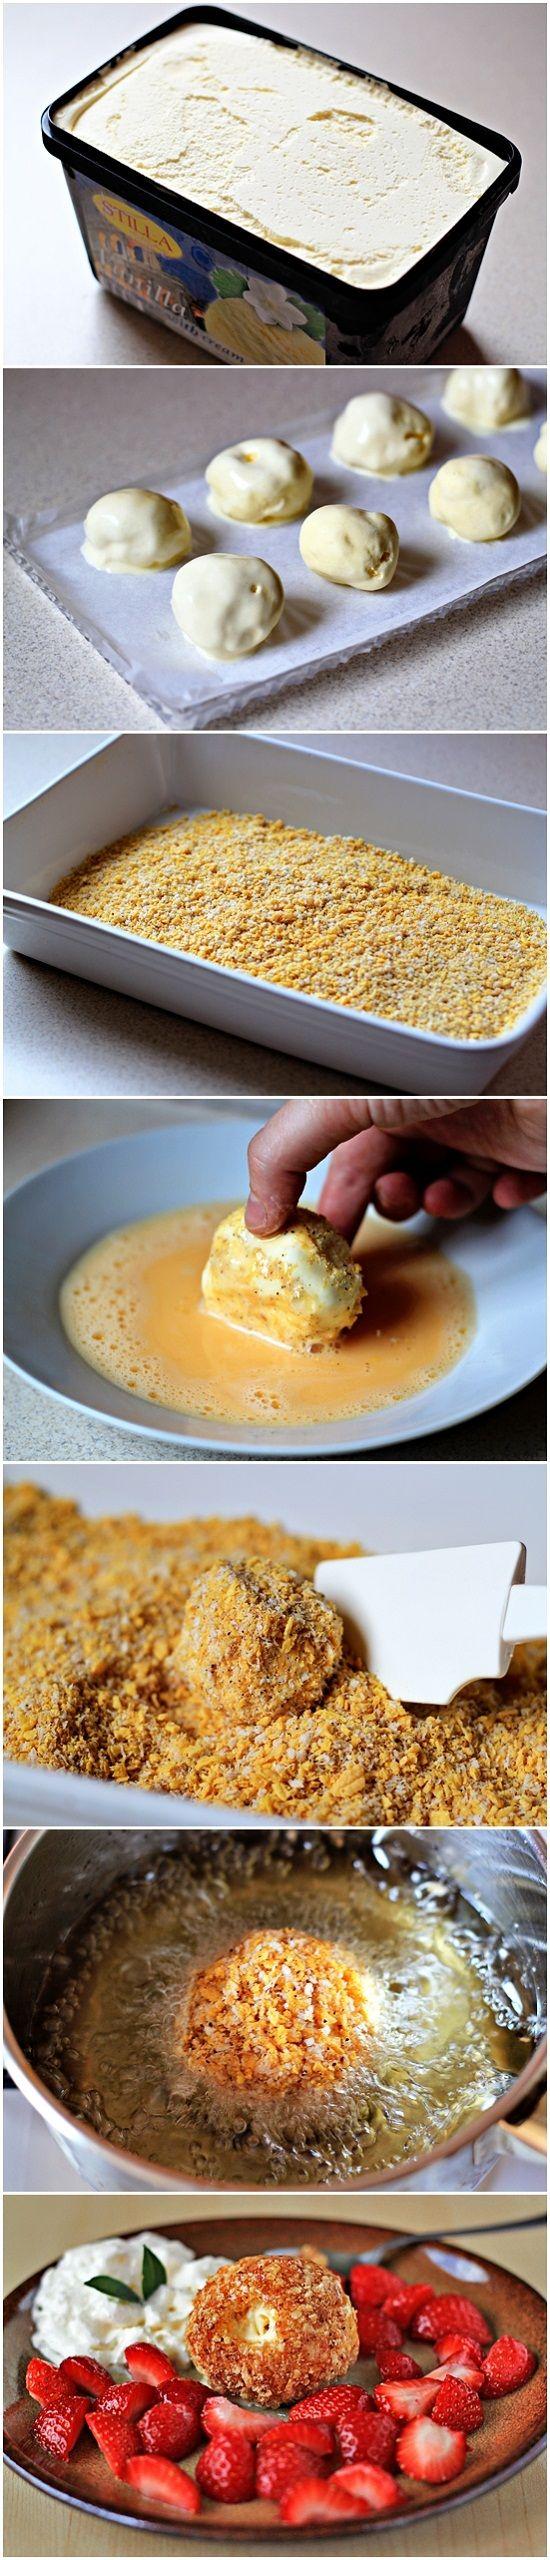 Fried Ice Cream | food | Pinterest